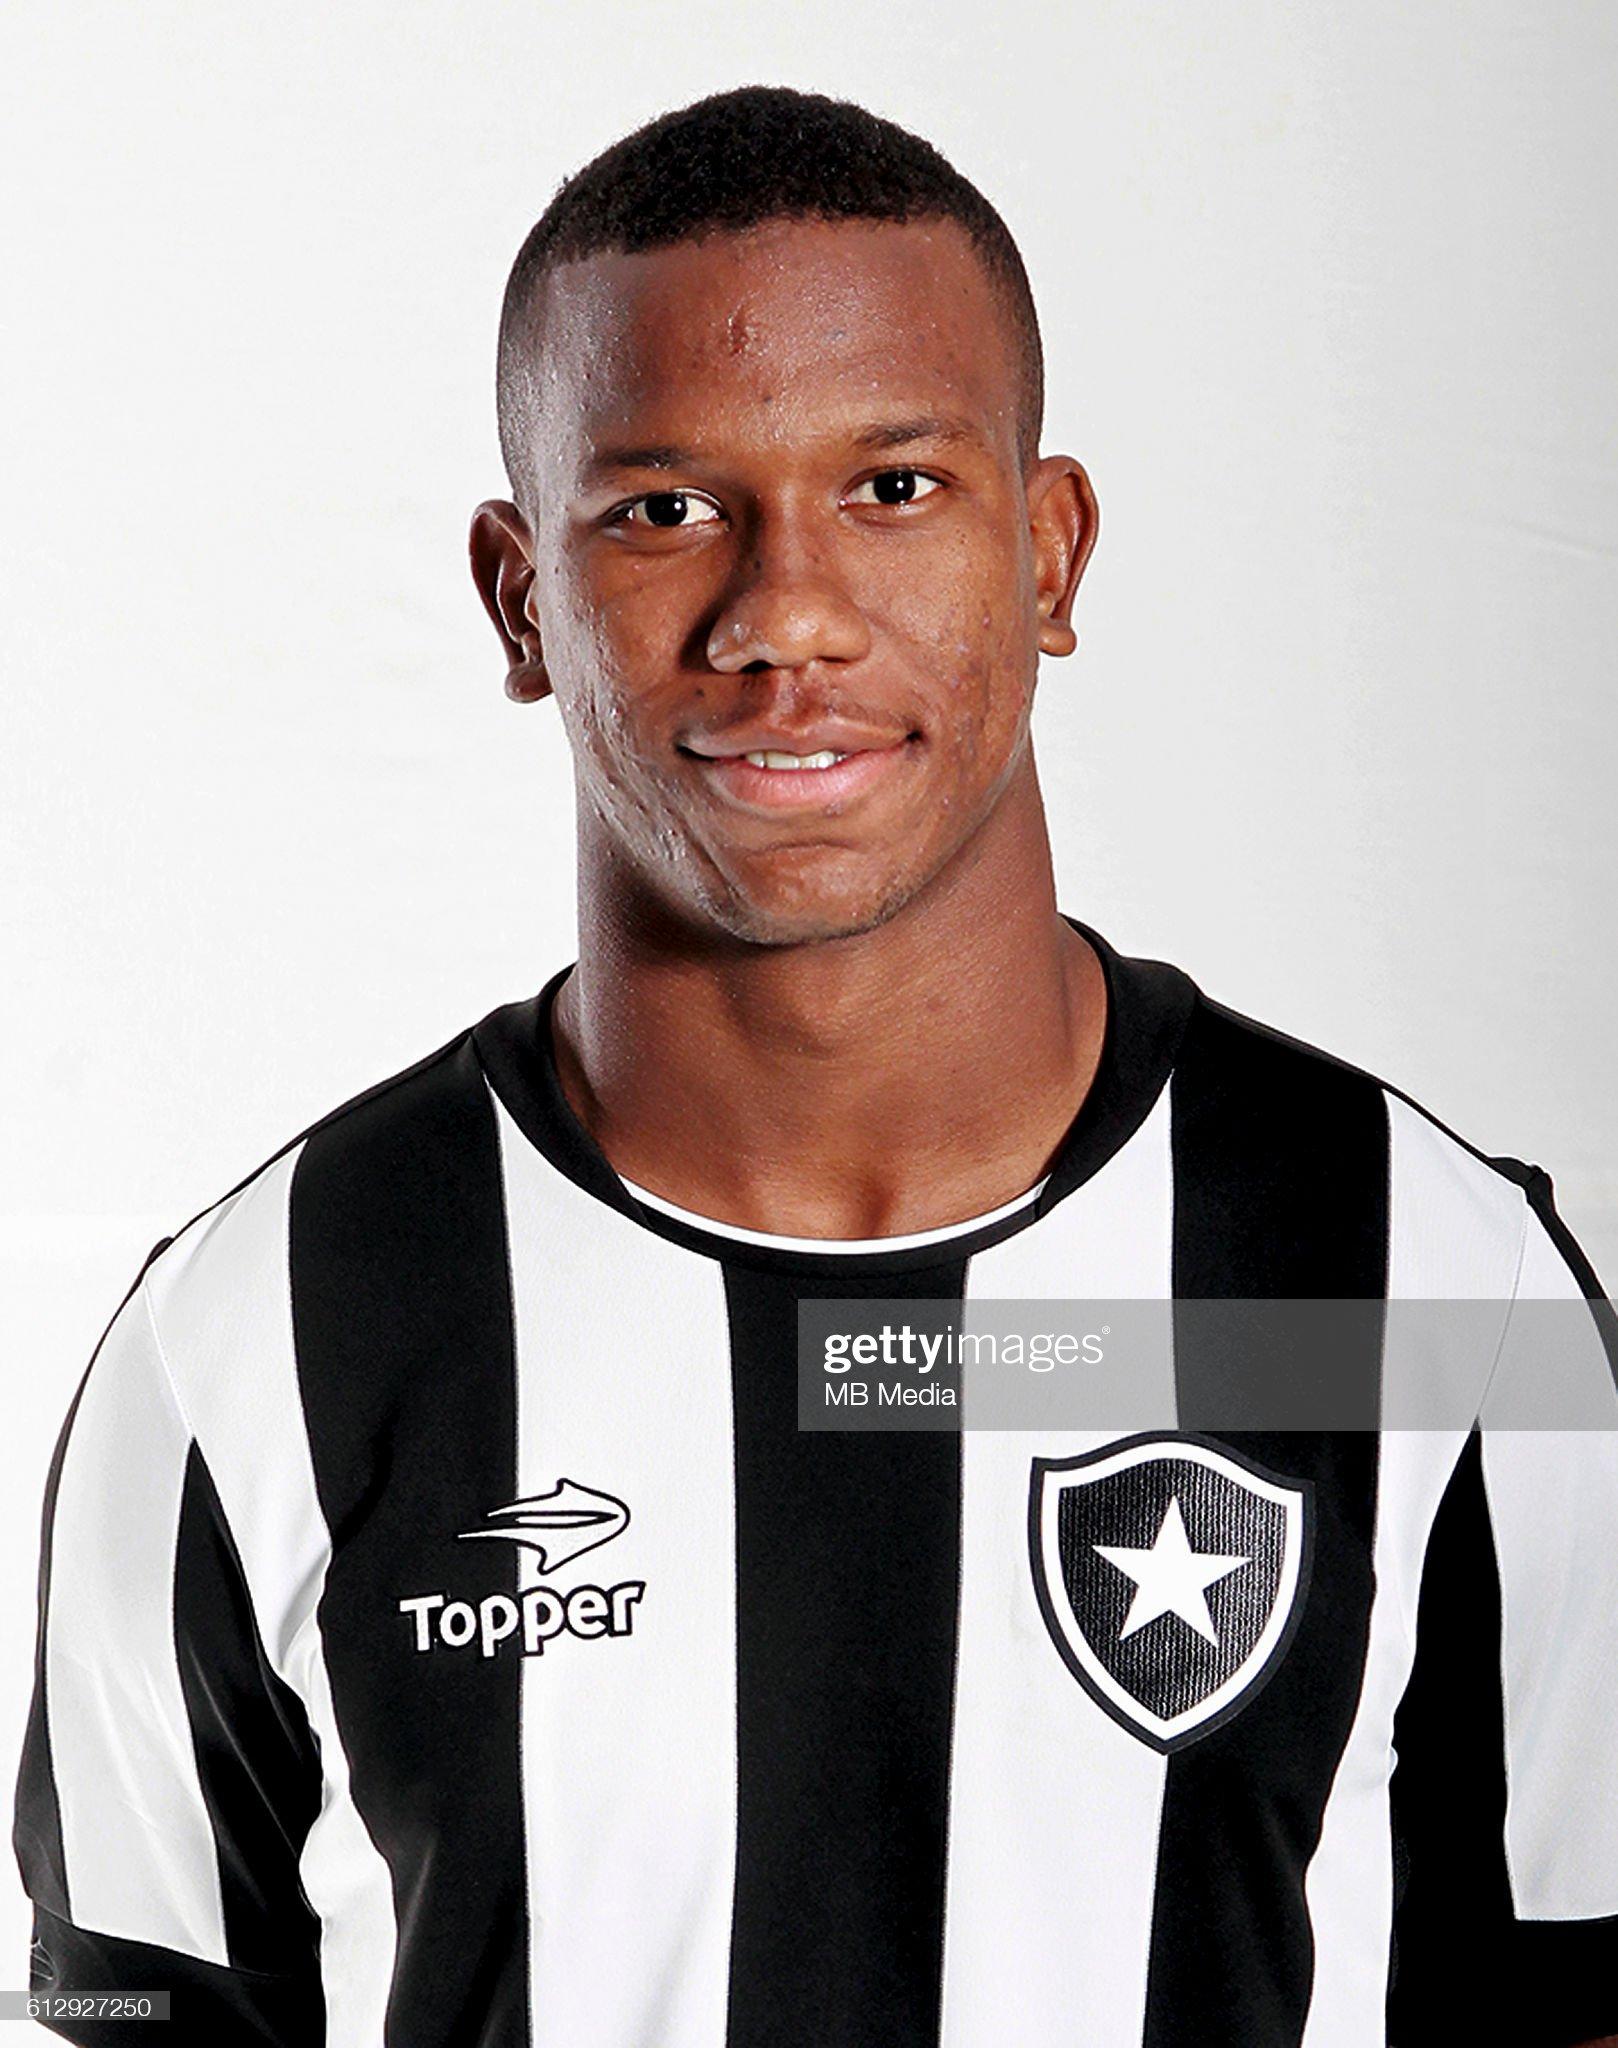 https://media.gettyimages.com/photos/brazilian-football-league-serie-a-lucas-ribamar-lopes-dos-santos-picture-id612927250?s=2048x2048